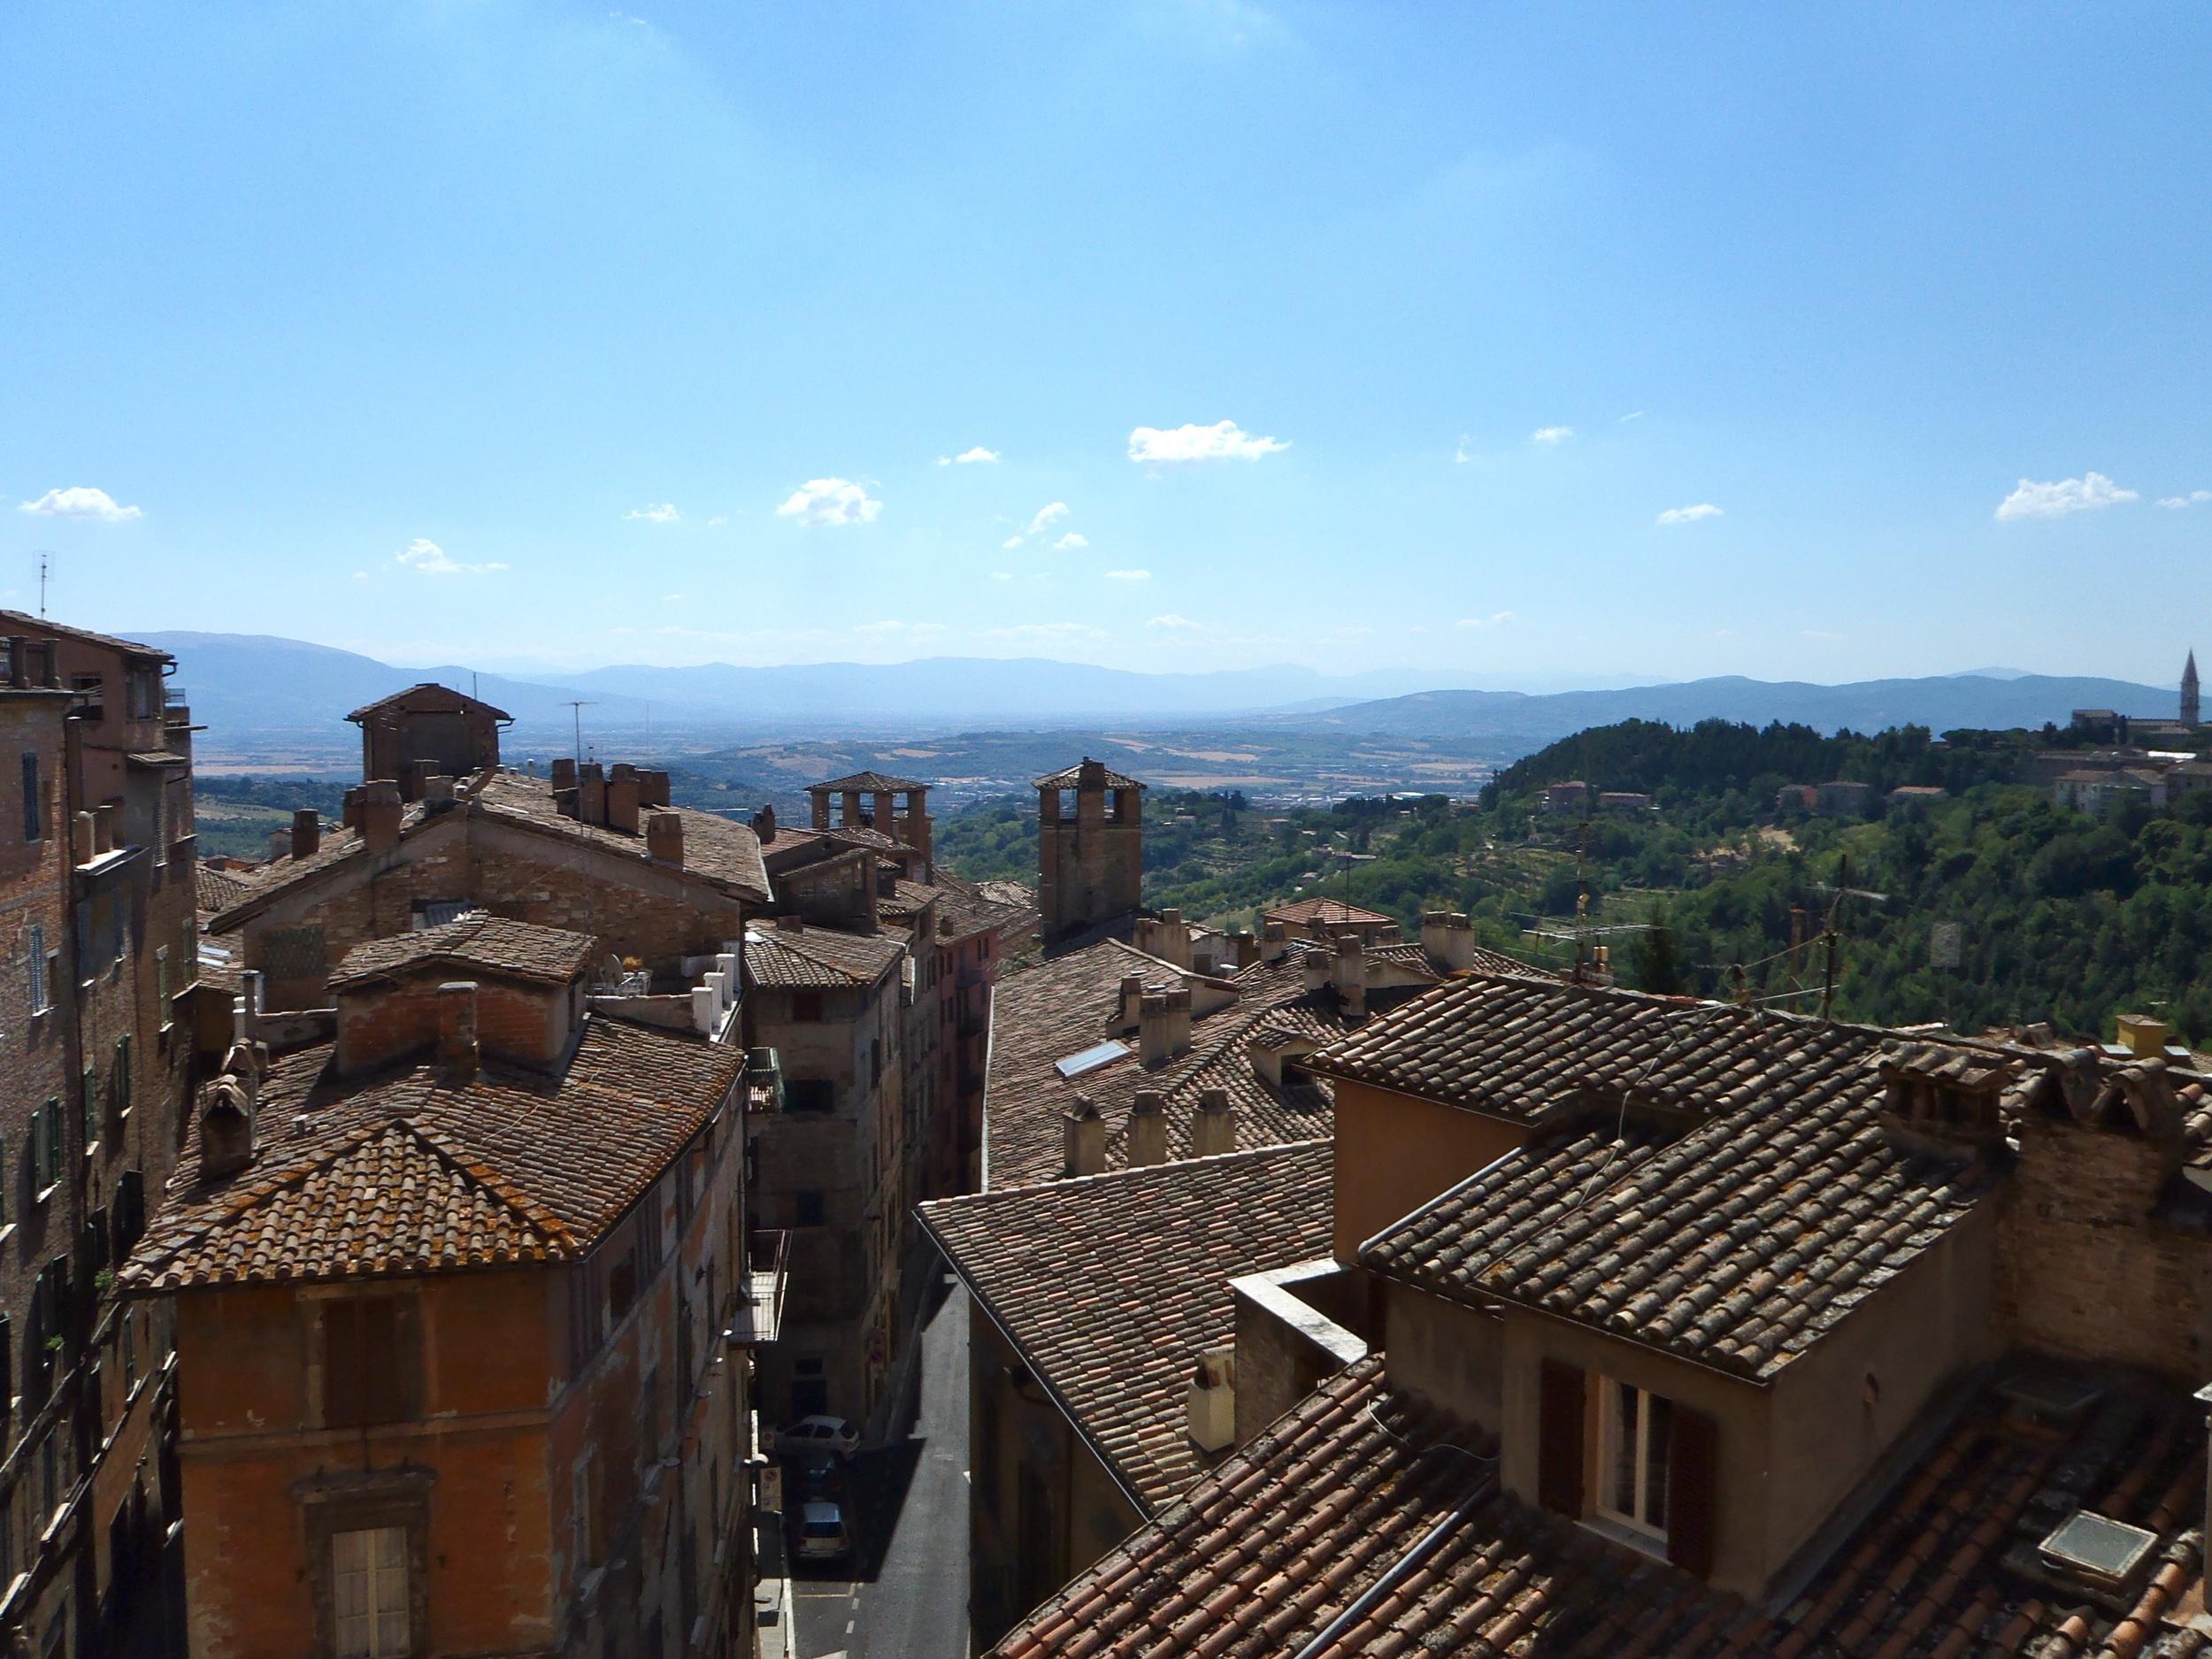 CRO Italy web 2012 - 20.jpg